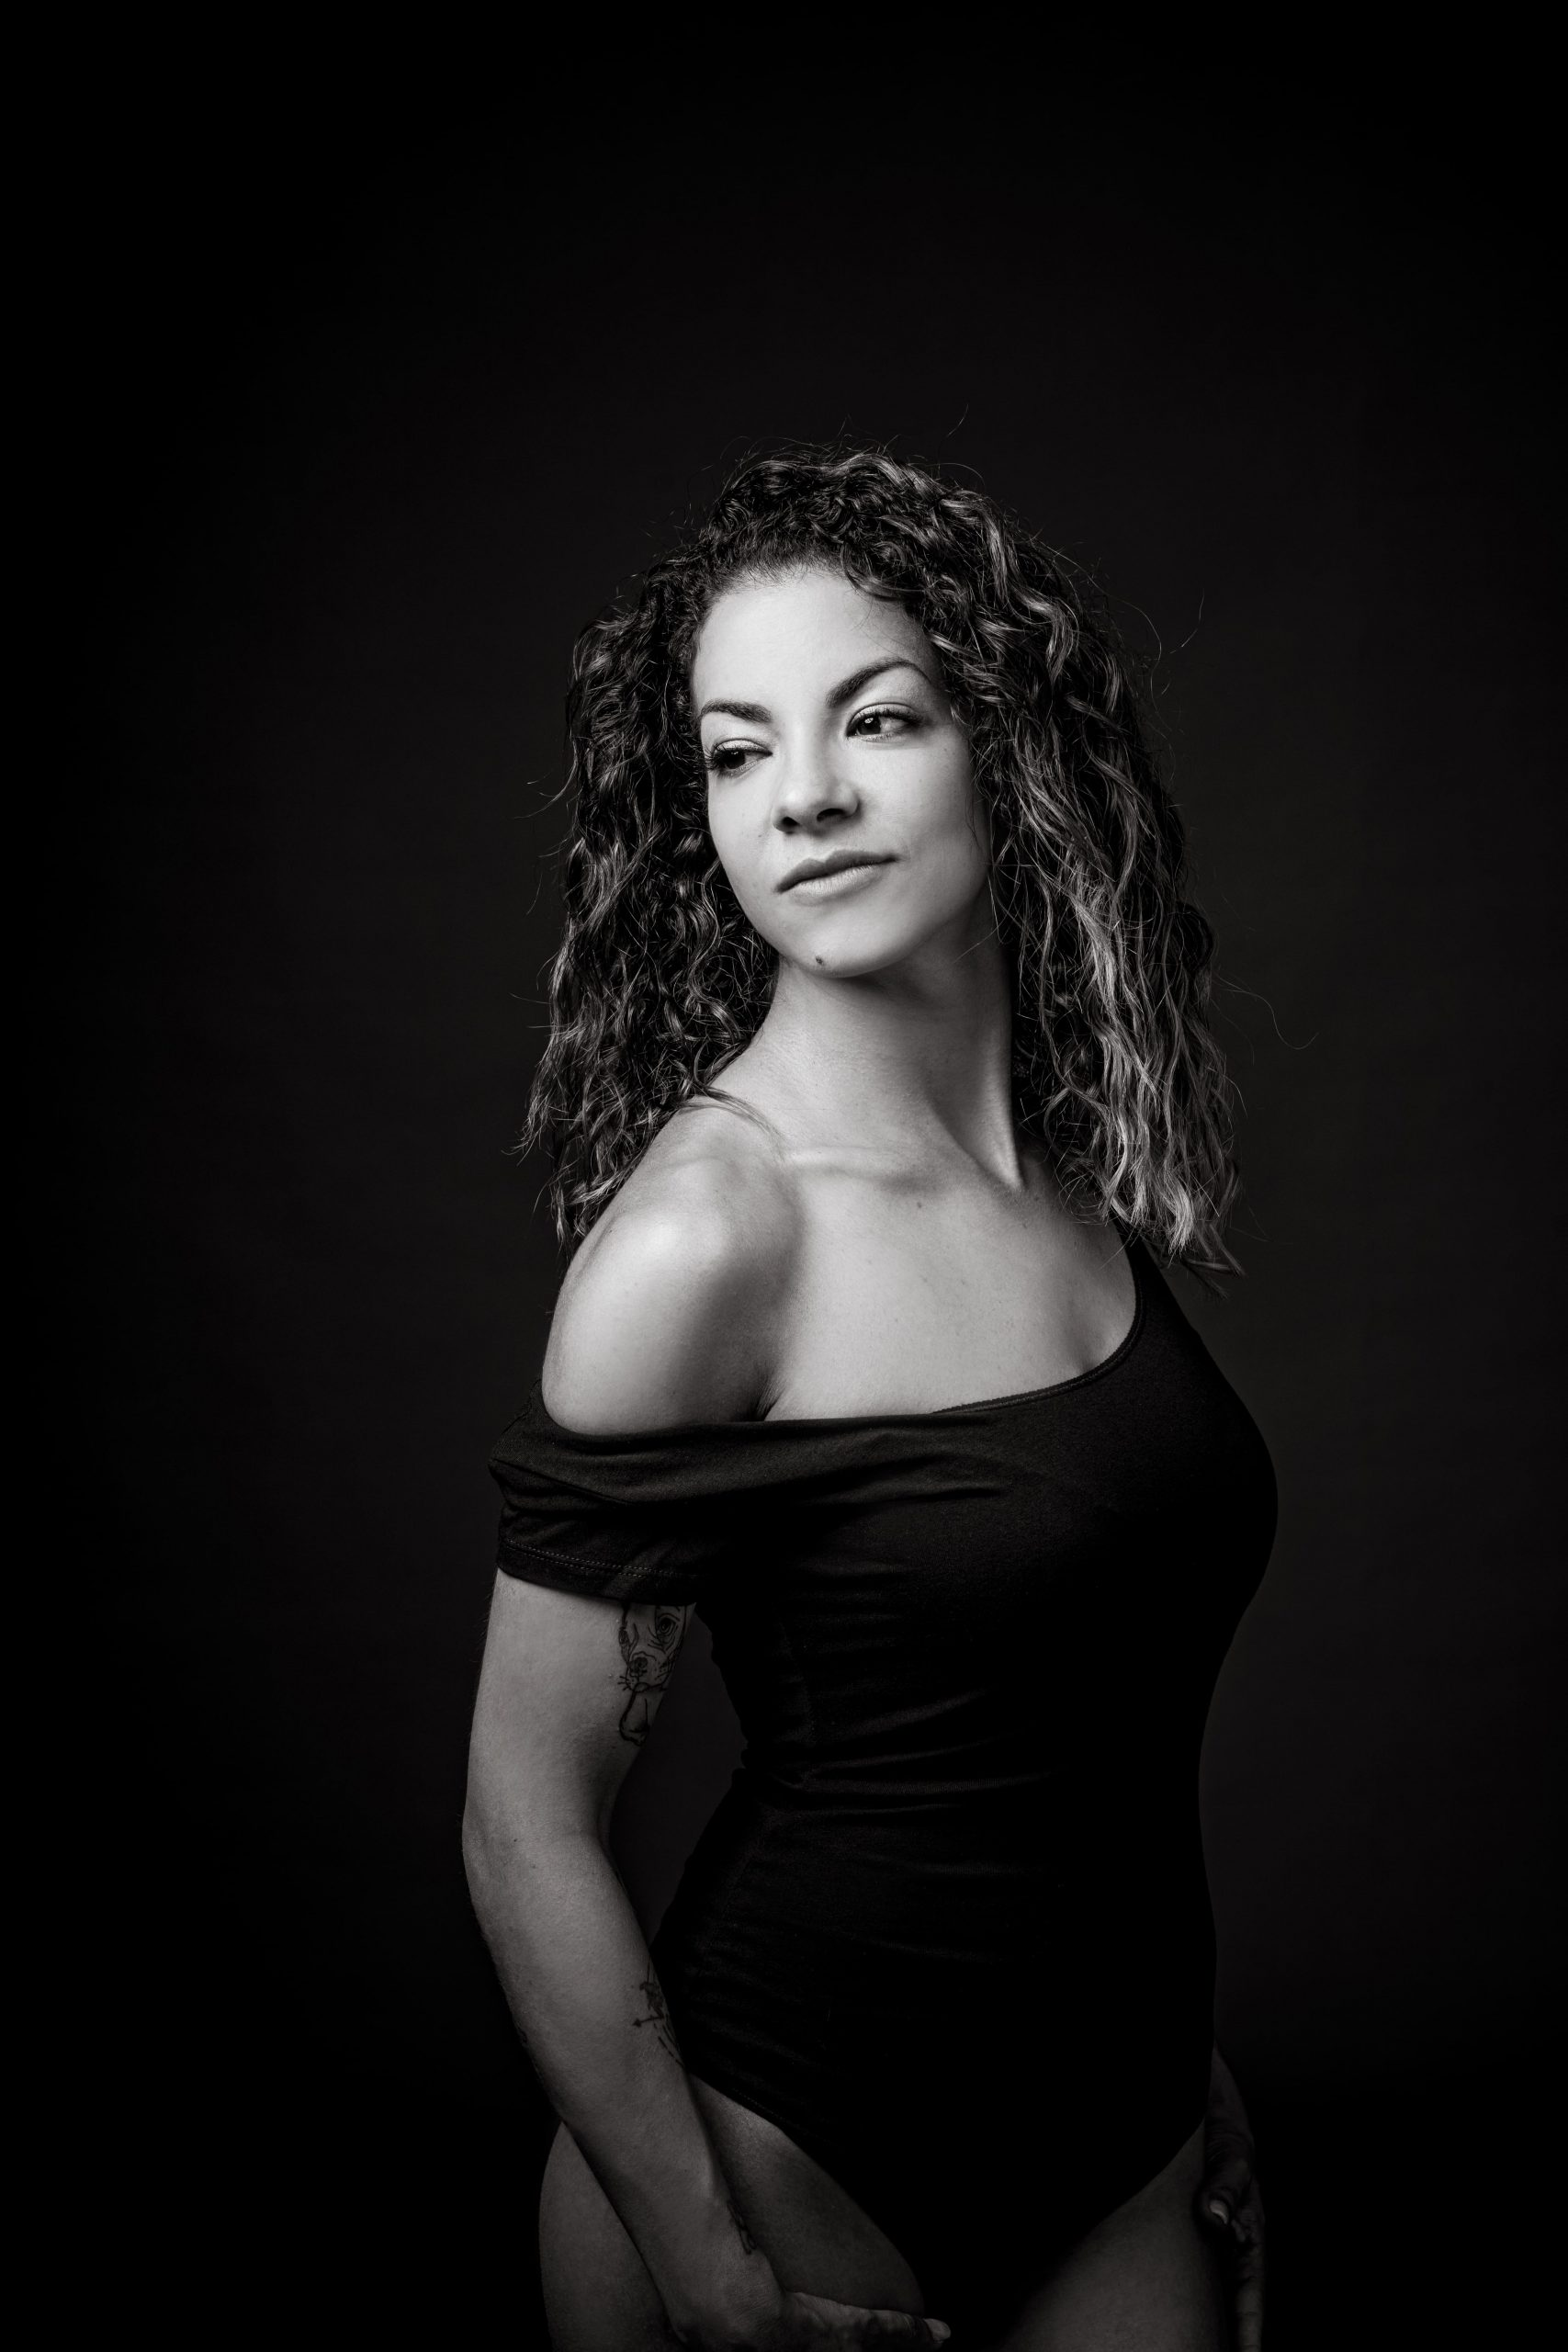 Lifestylephotodesign Melanieschmidt Beautyportrait Salwa 058